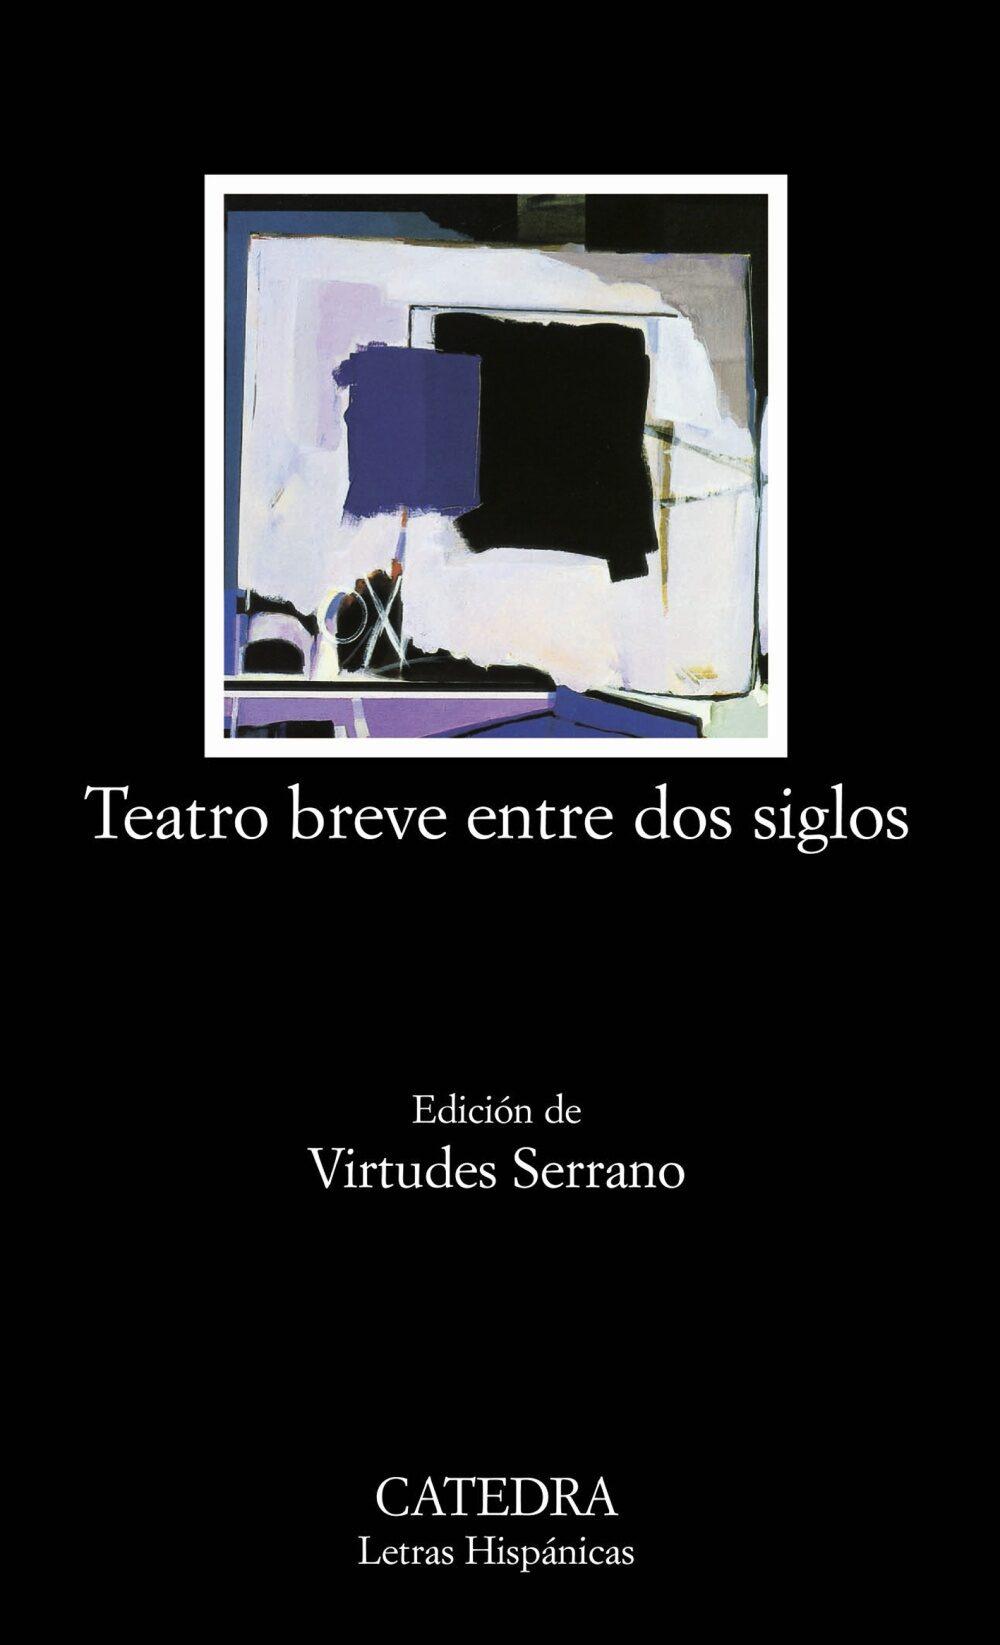 Teatro Breve Entre Dos Siglos: Antologia por Virtudes Serrano